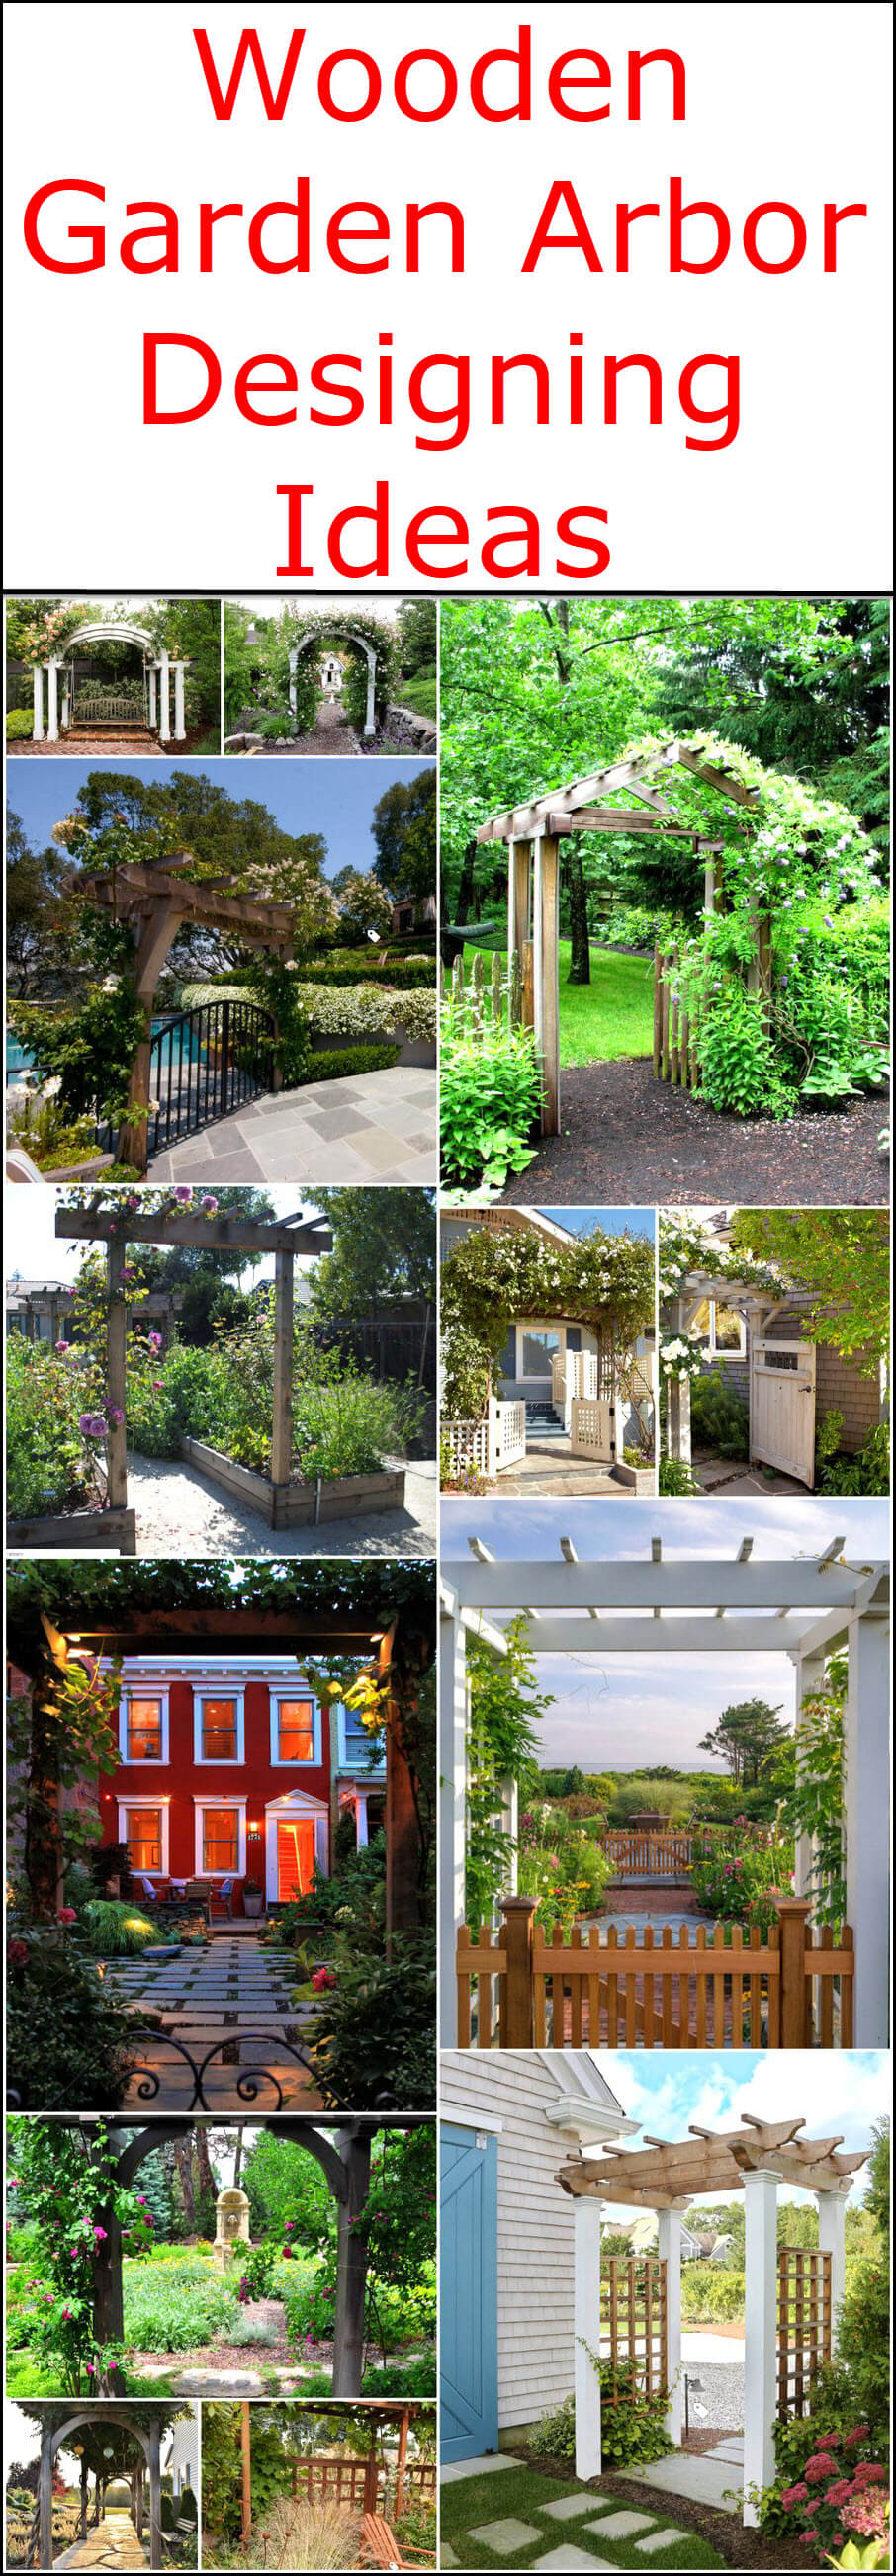 Wooden Garden Arbor Designing Ideas